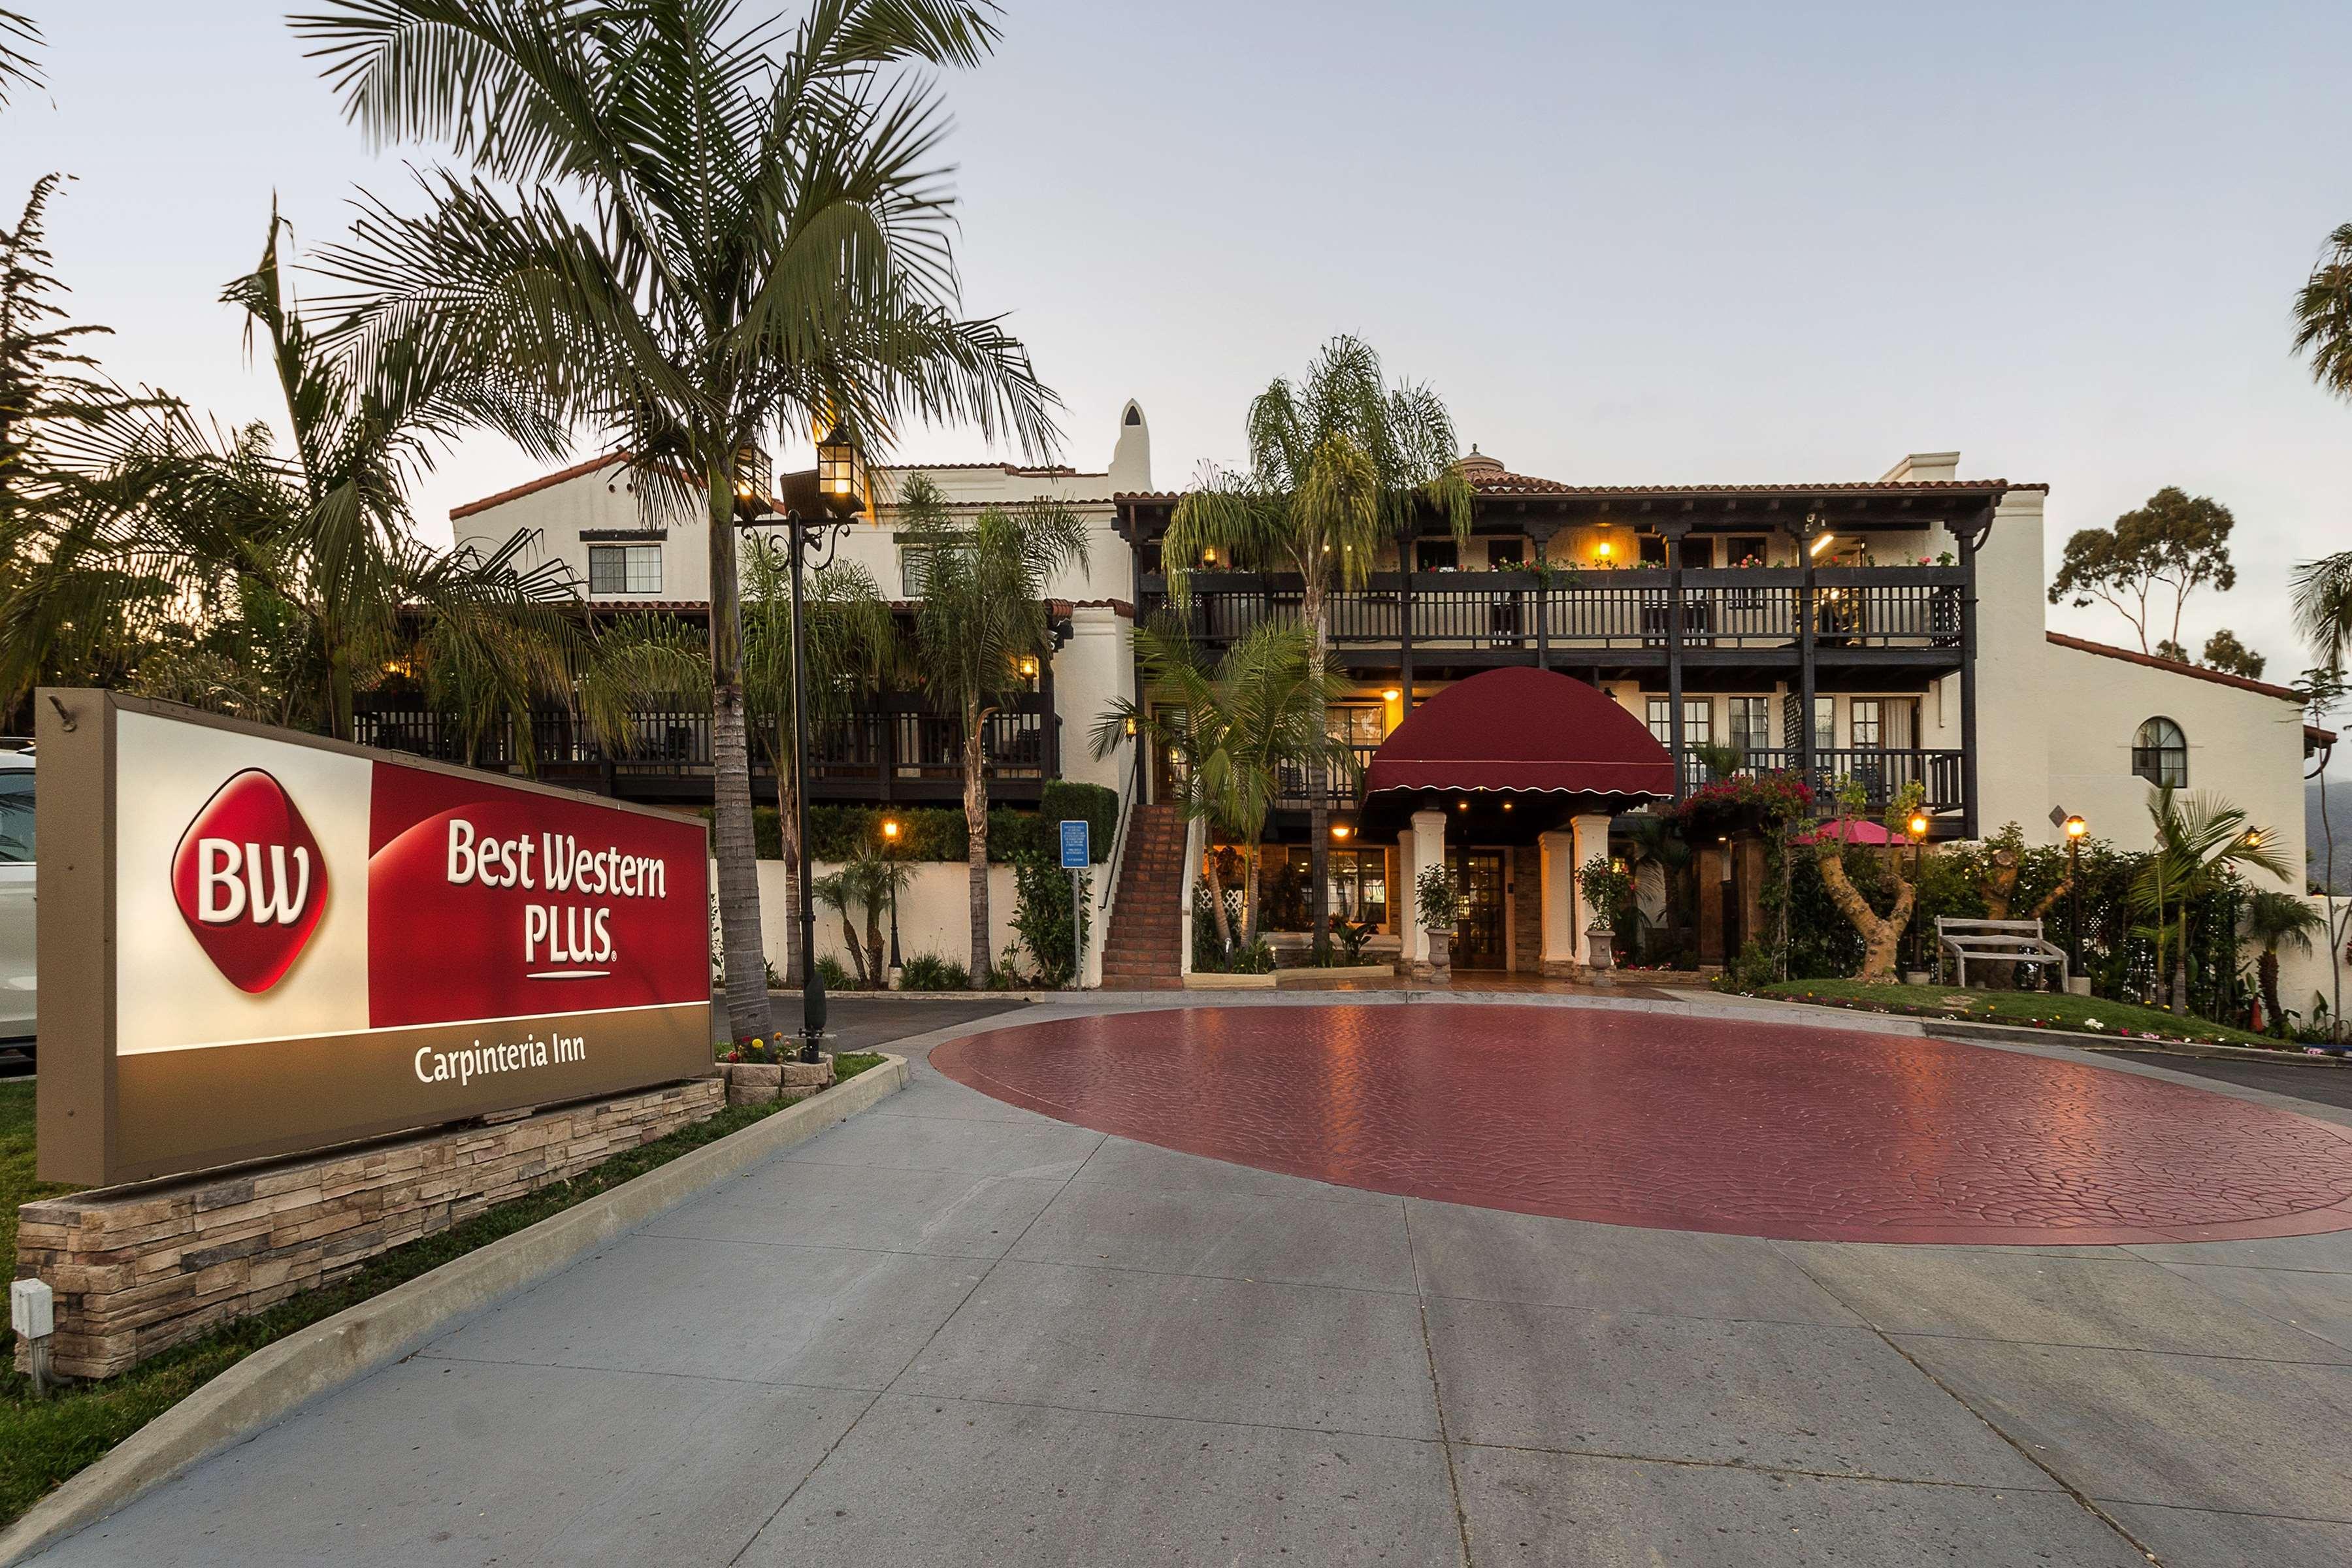 Best Western Plus Carpinteria Inn image 1